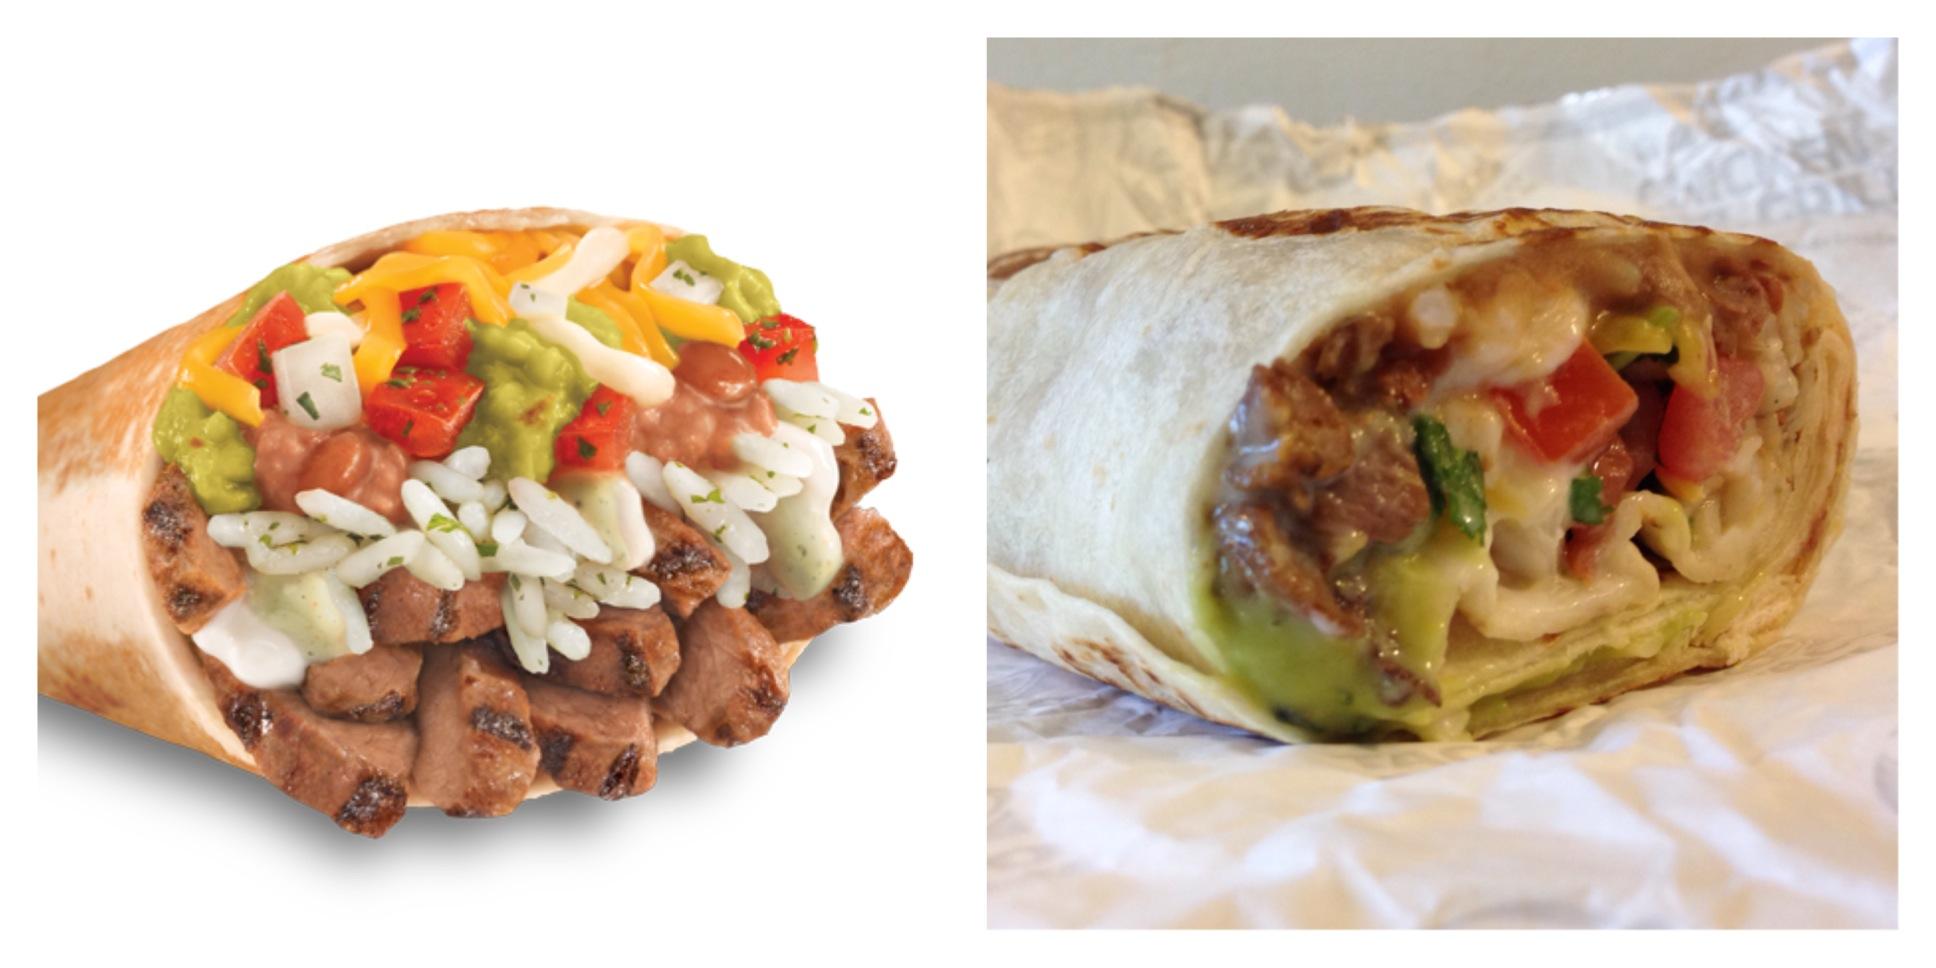 XXL-Grilled-Stuft-Steak-Burrito-Taco-Bell